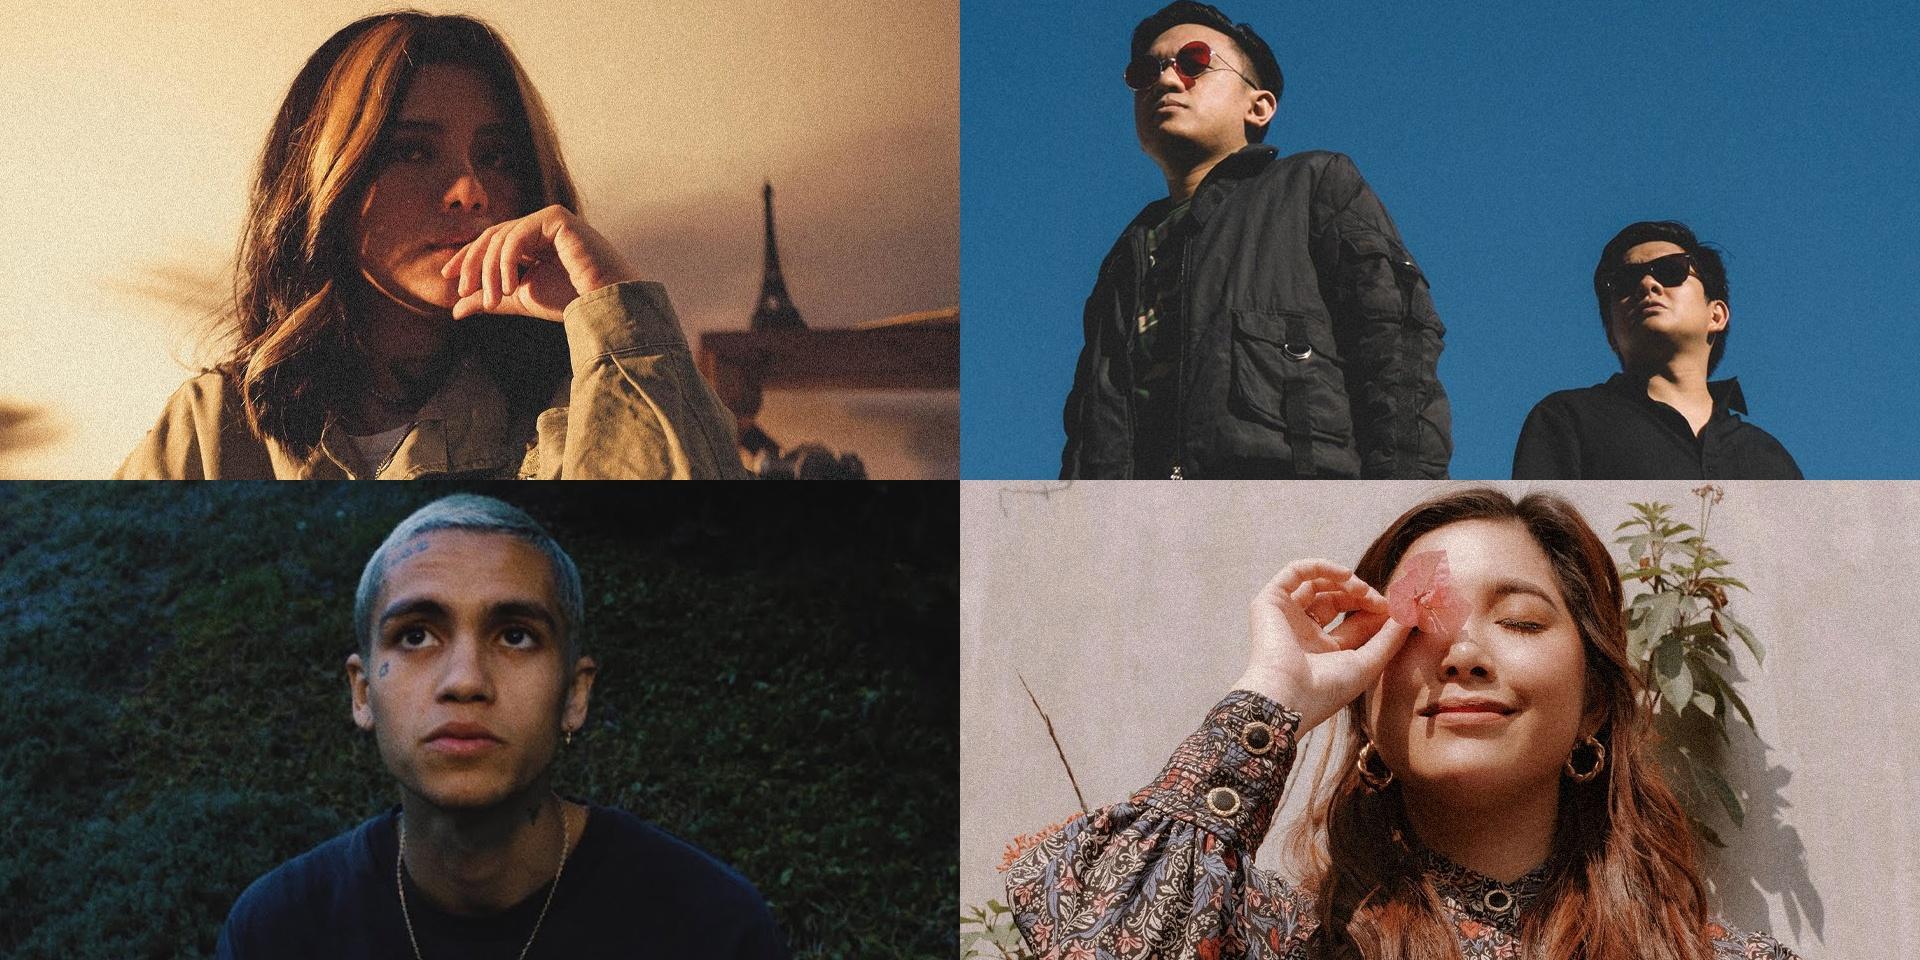 Keiko Necesario, Mandaue Nights, Dominic Fike, Moira dela Torre, and more release new music – listen